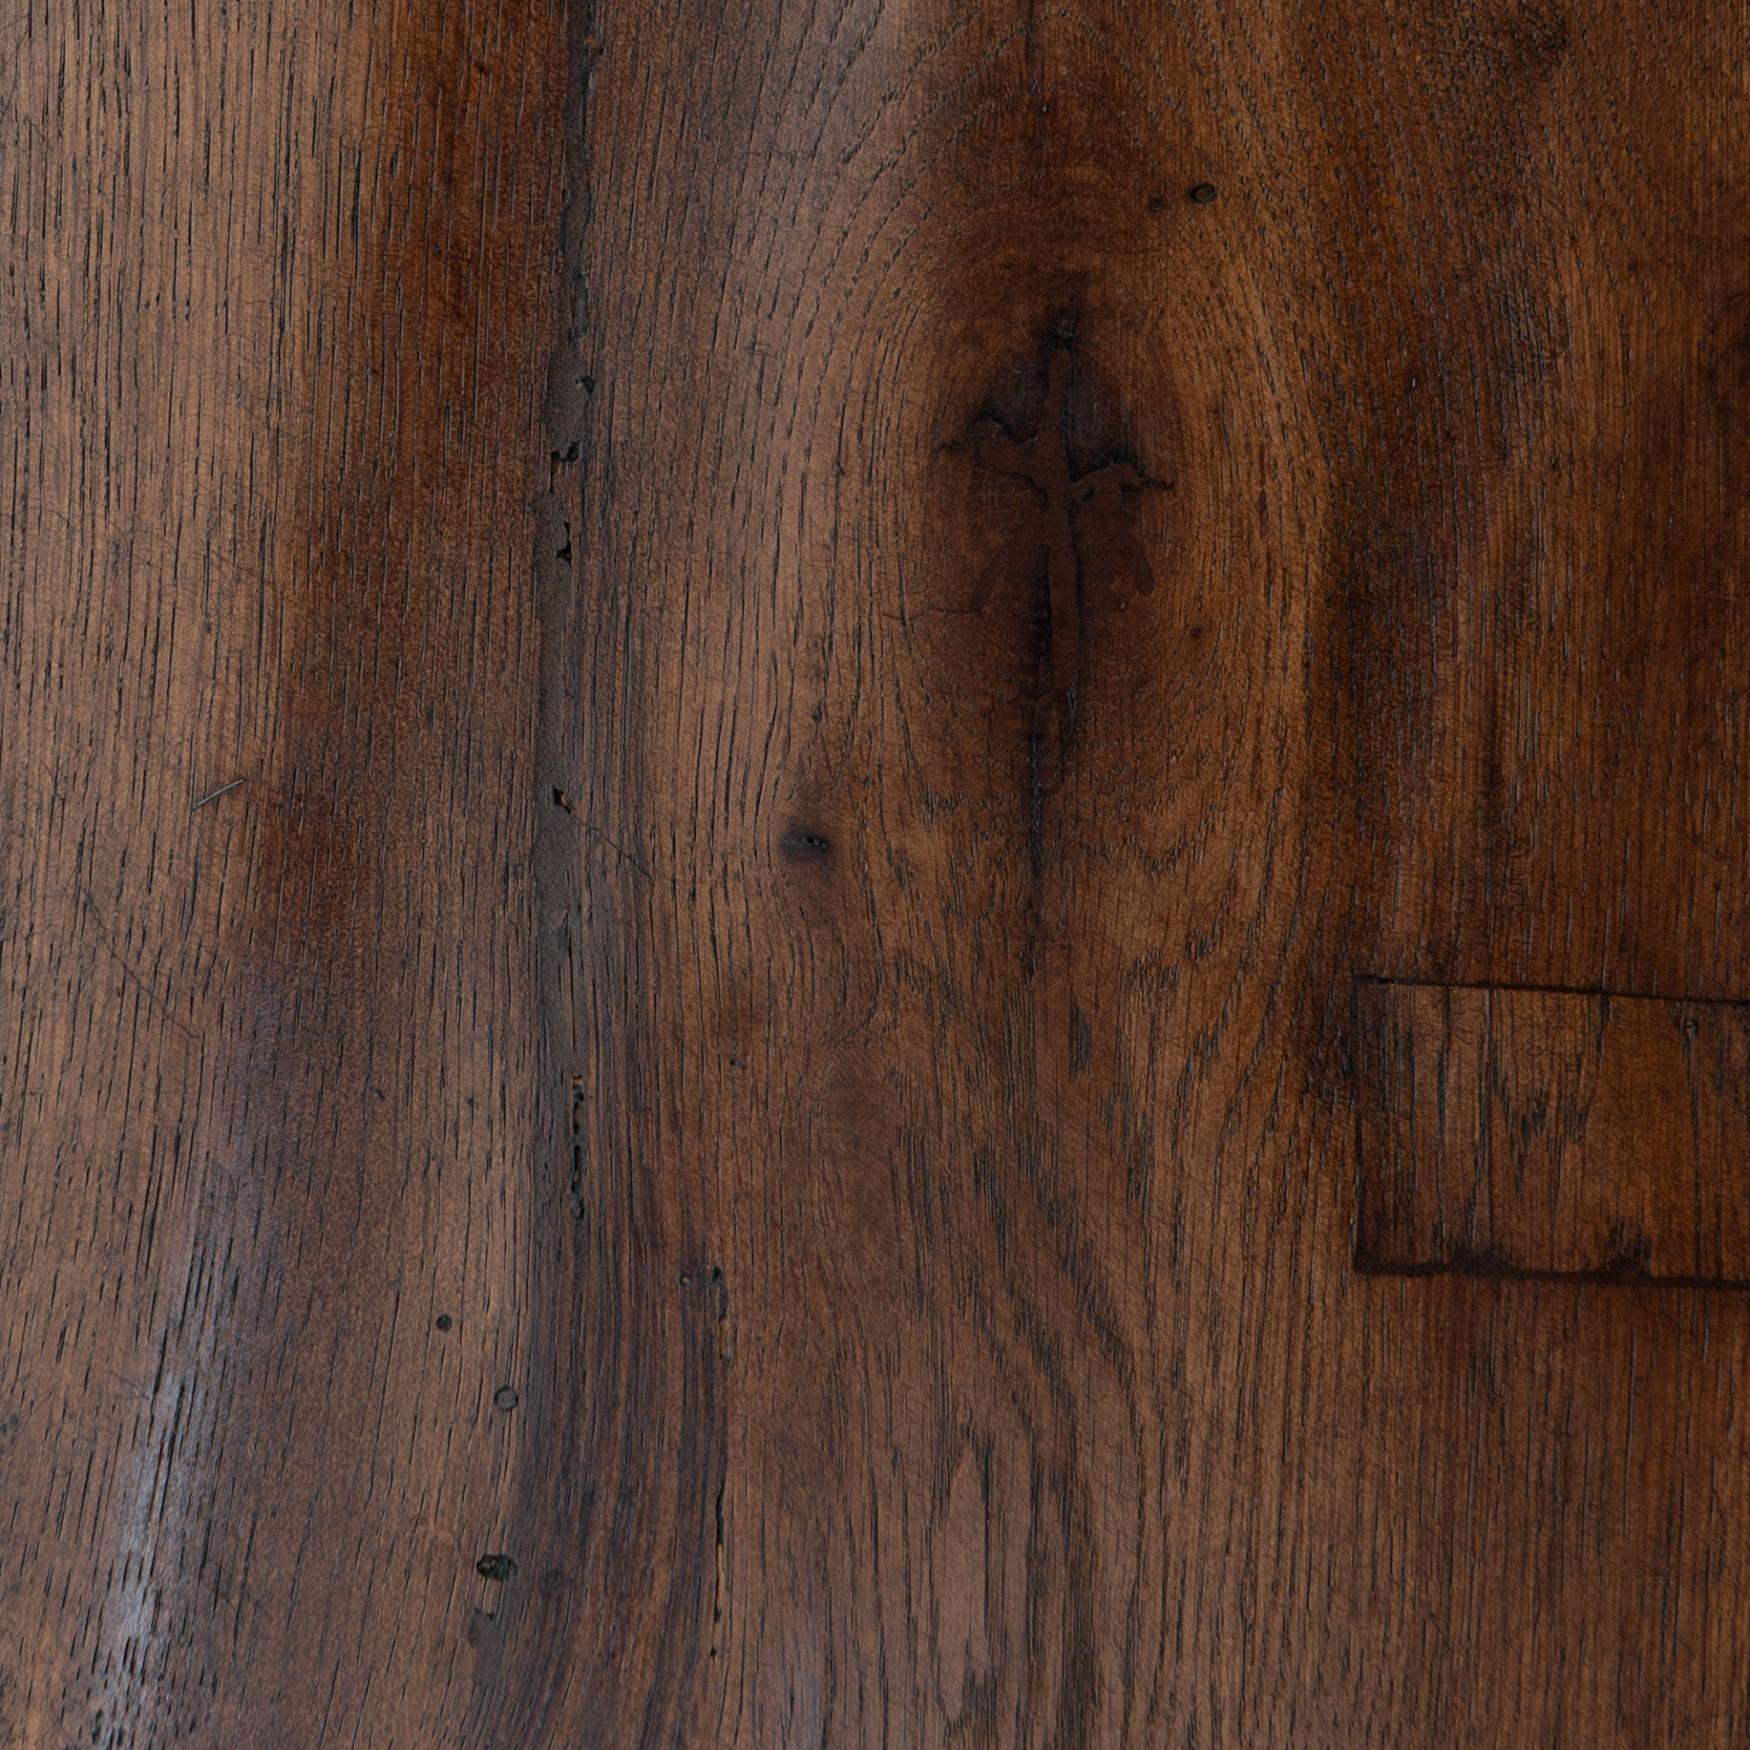 Element7-wide-plank-samples-reclaimed-brown-oak-class-IMG_1926.CMYK-RT